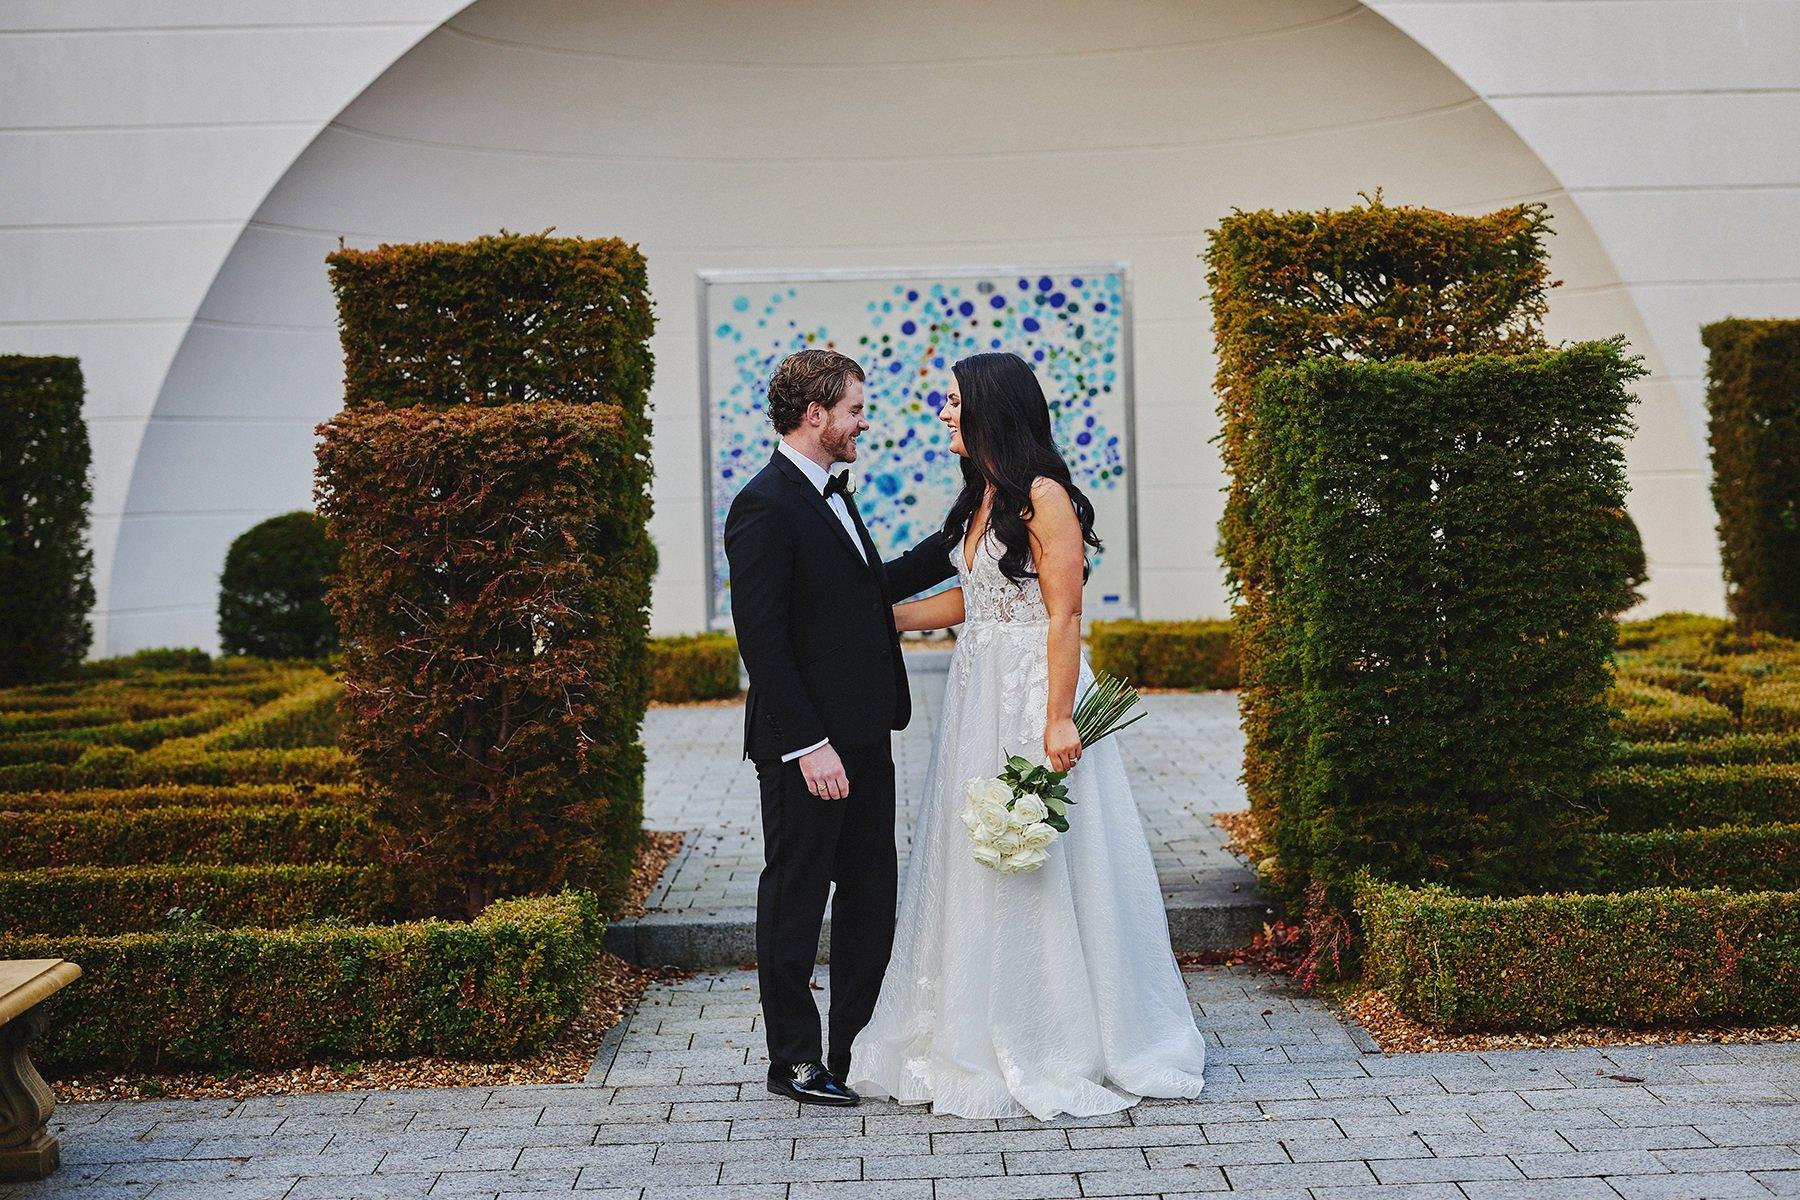 POWERSCOURT HOTEL RESORT INTIMATE WEDDING 70